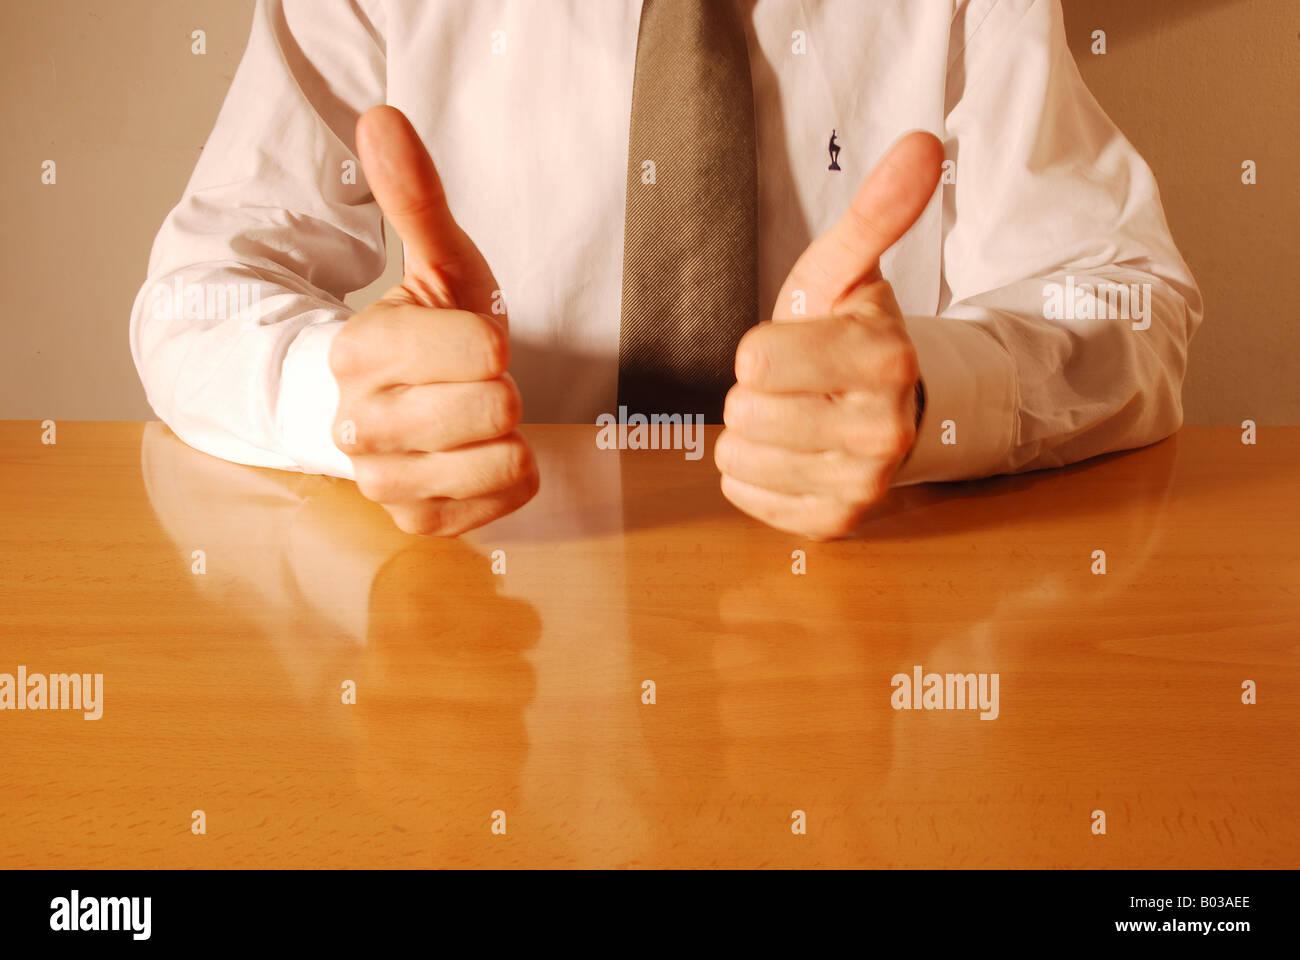 Gesti con le mani: Thumbs up. Immagini Stock